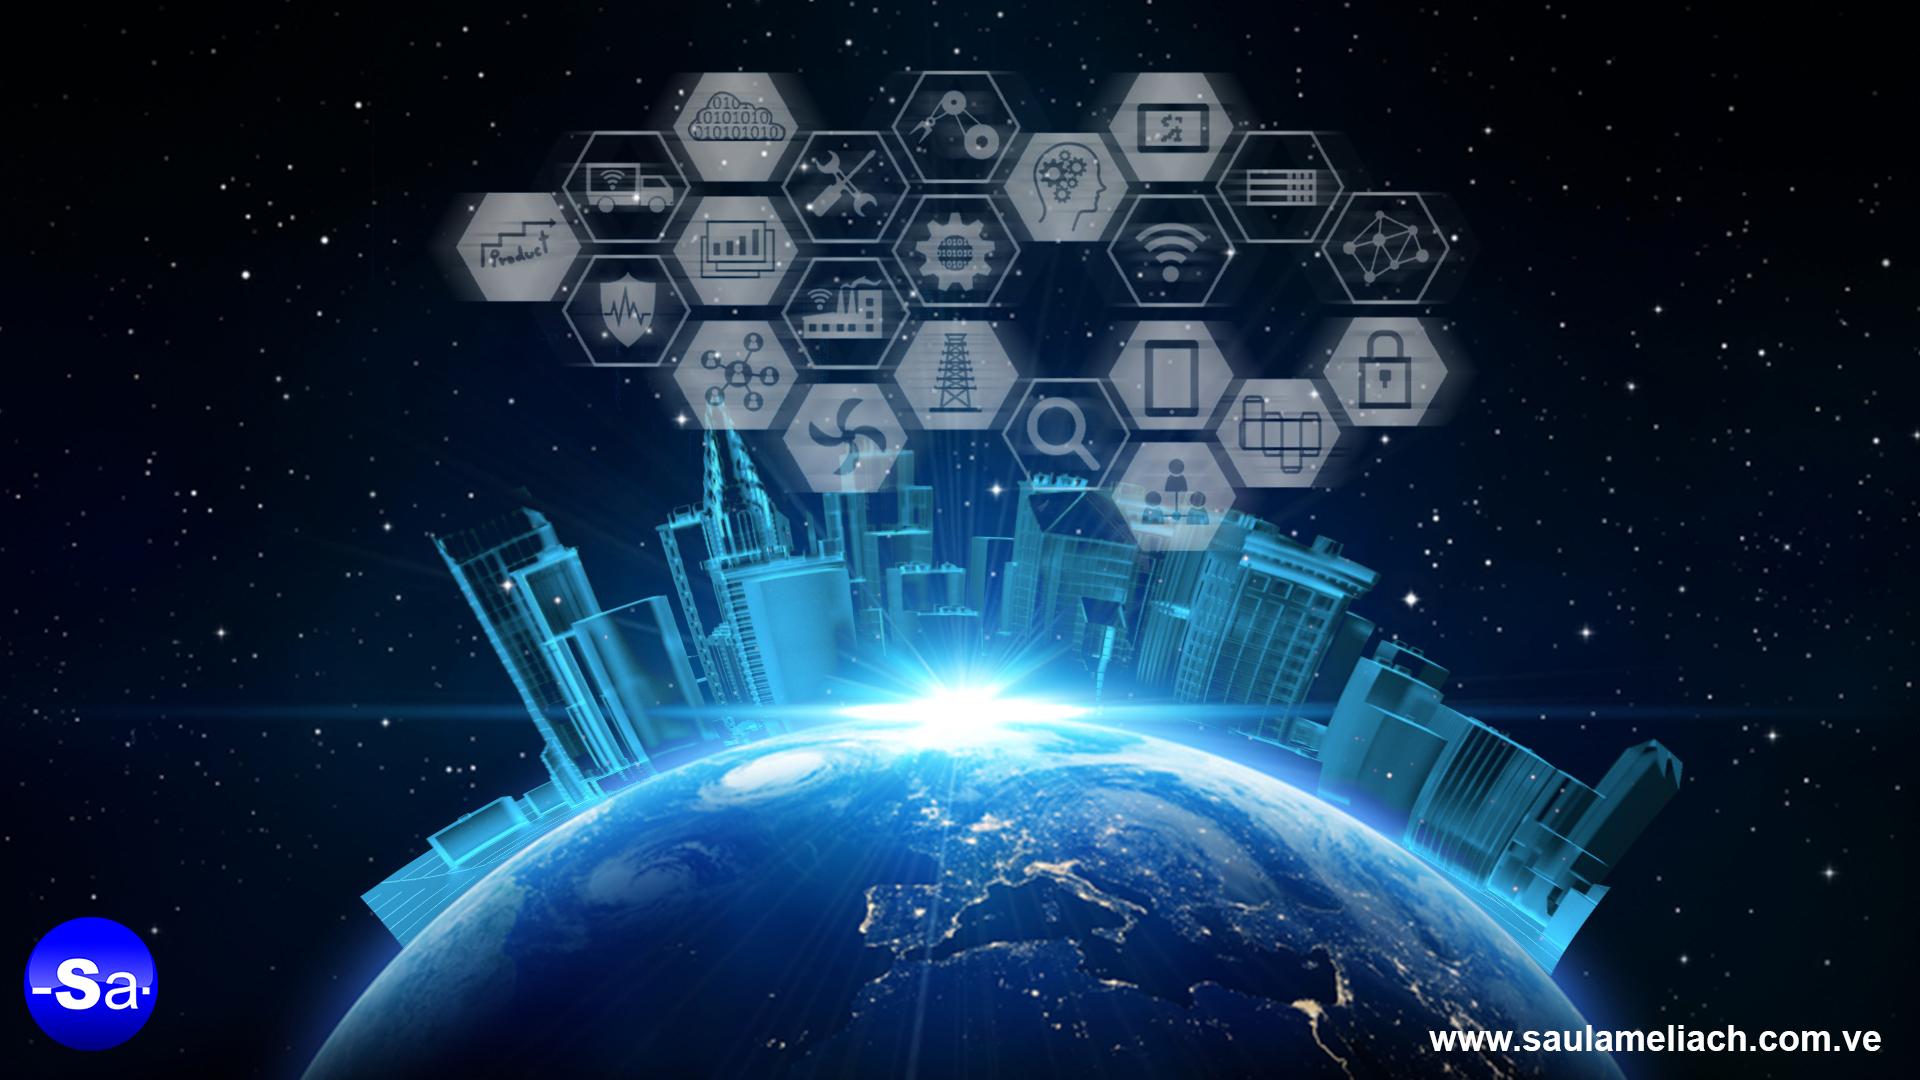 saul ameliach - producción - tecnologías 4.0